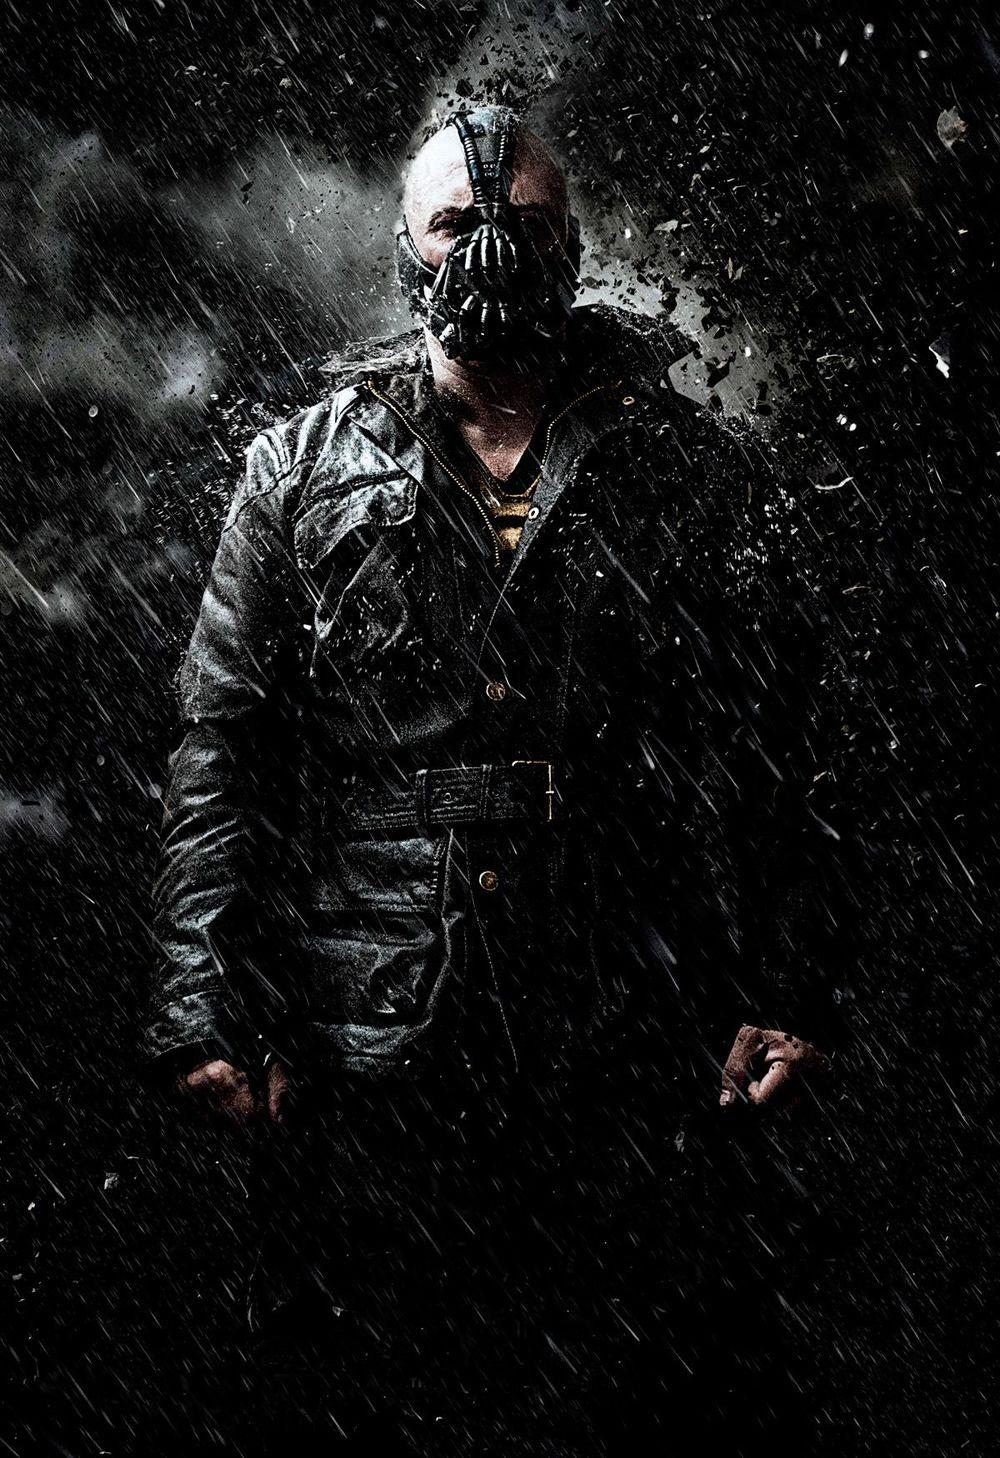 Bane (Nolanverse) | Villains Wiki | FANDOM powered by Wikia